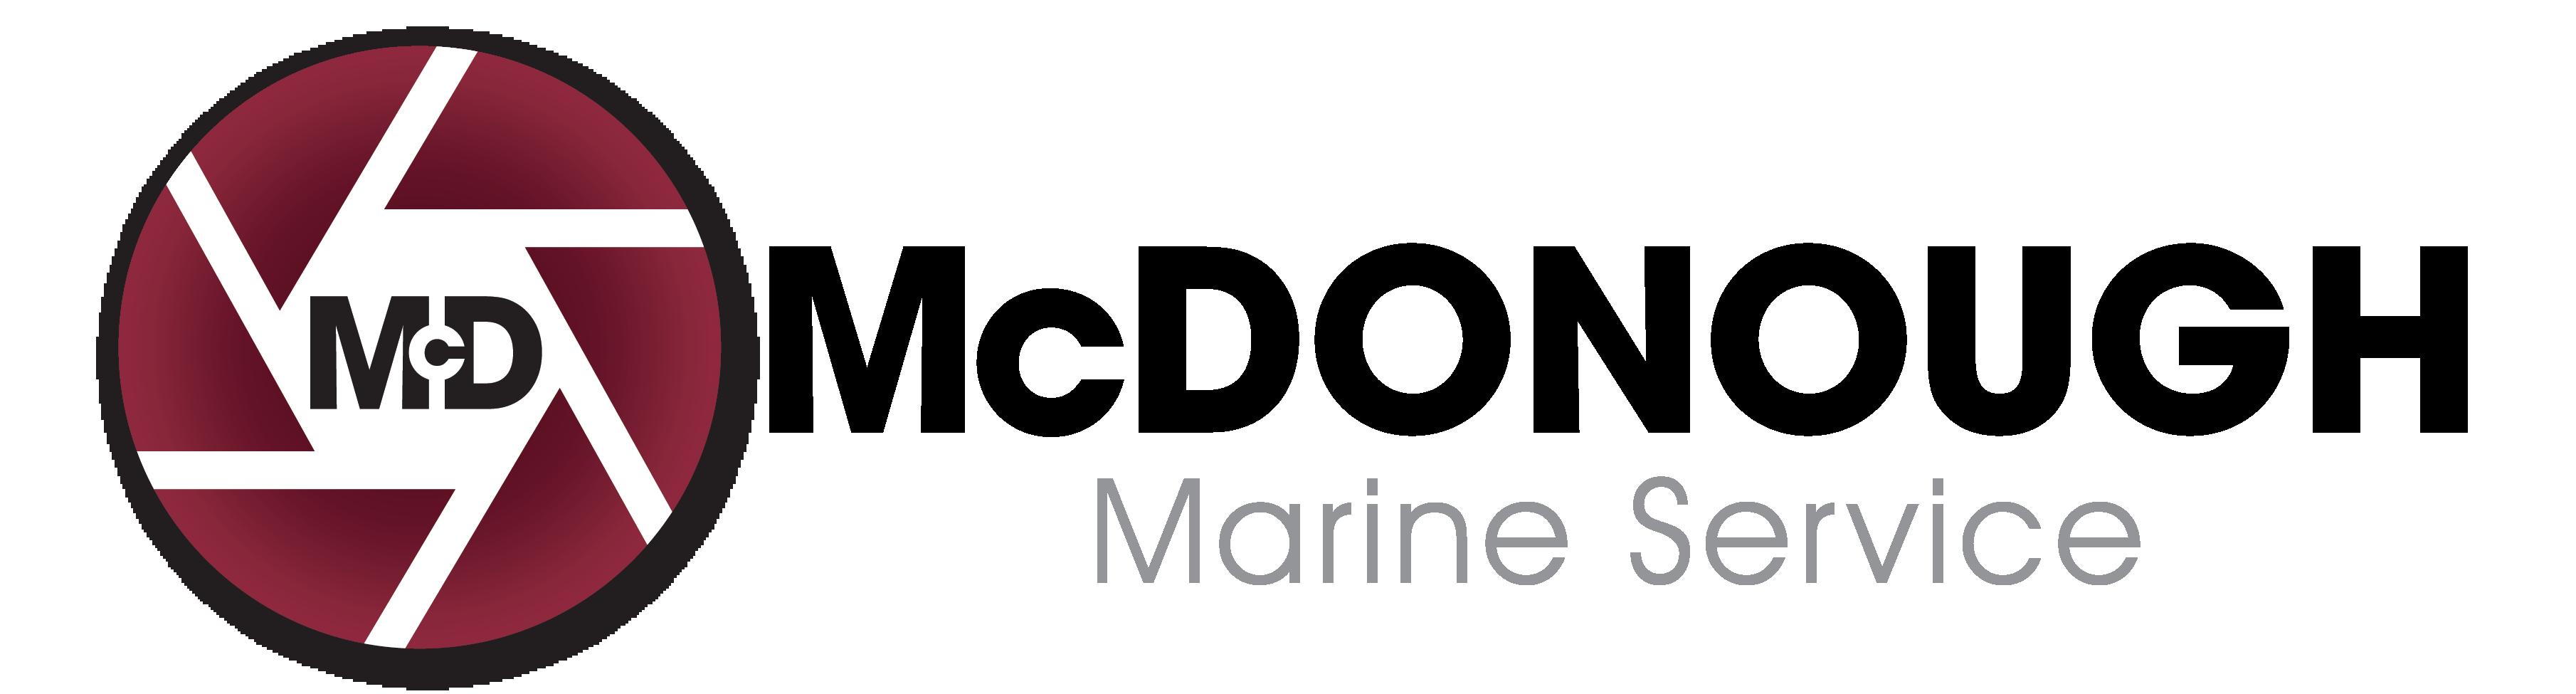 McDonough Marine Service